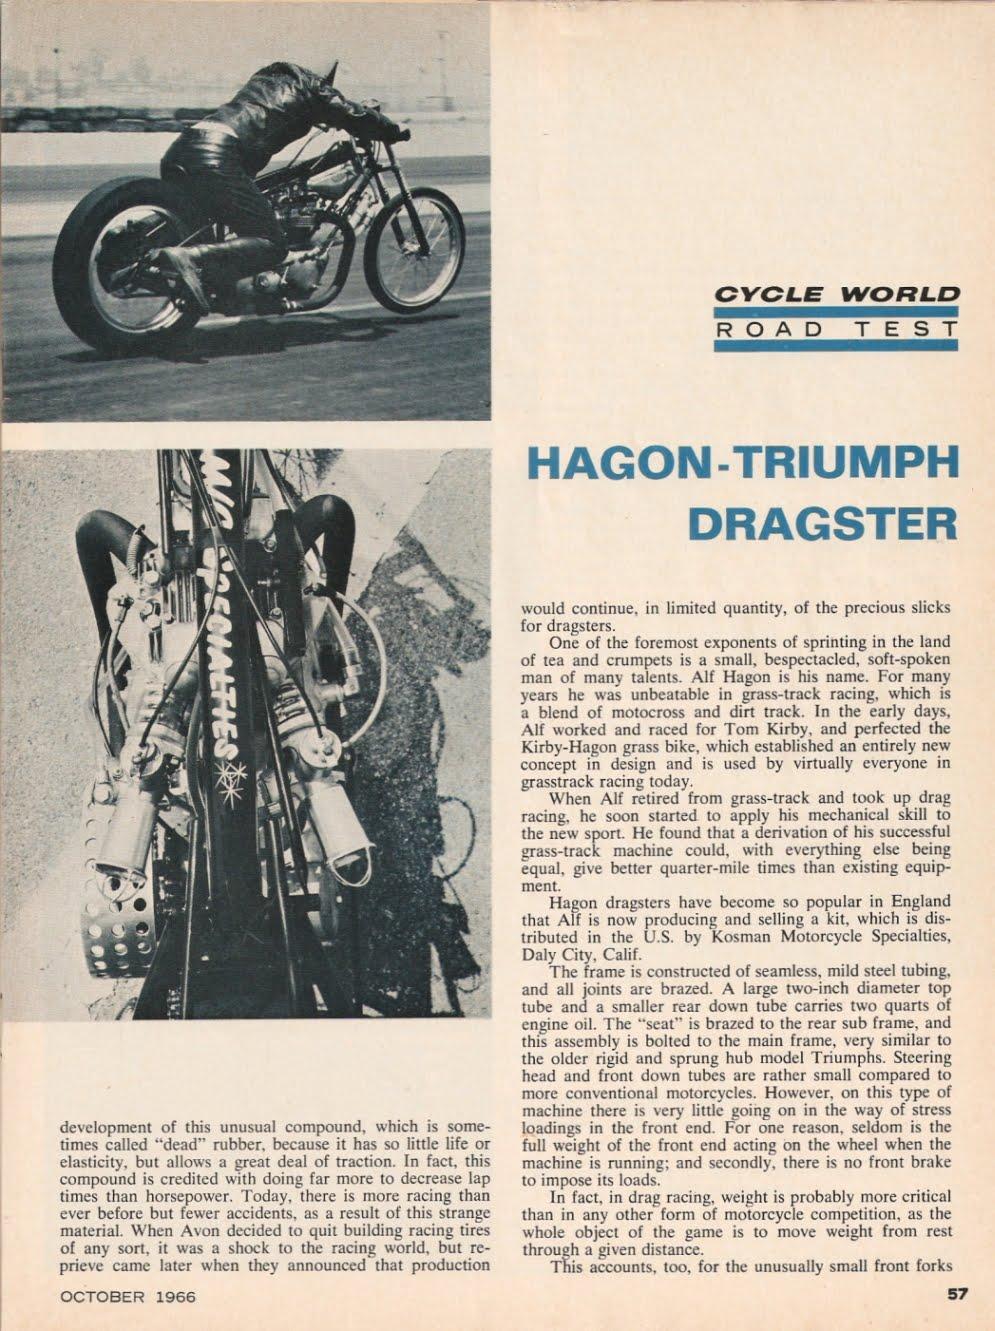 Kosman racing products - Hagon Triumph Drag Bike